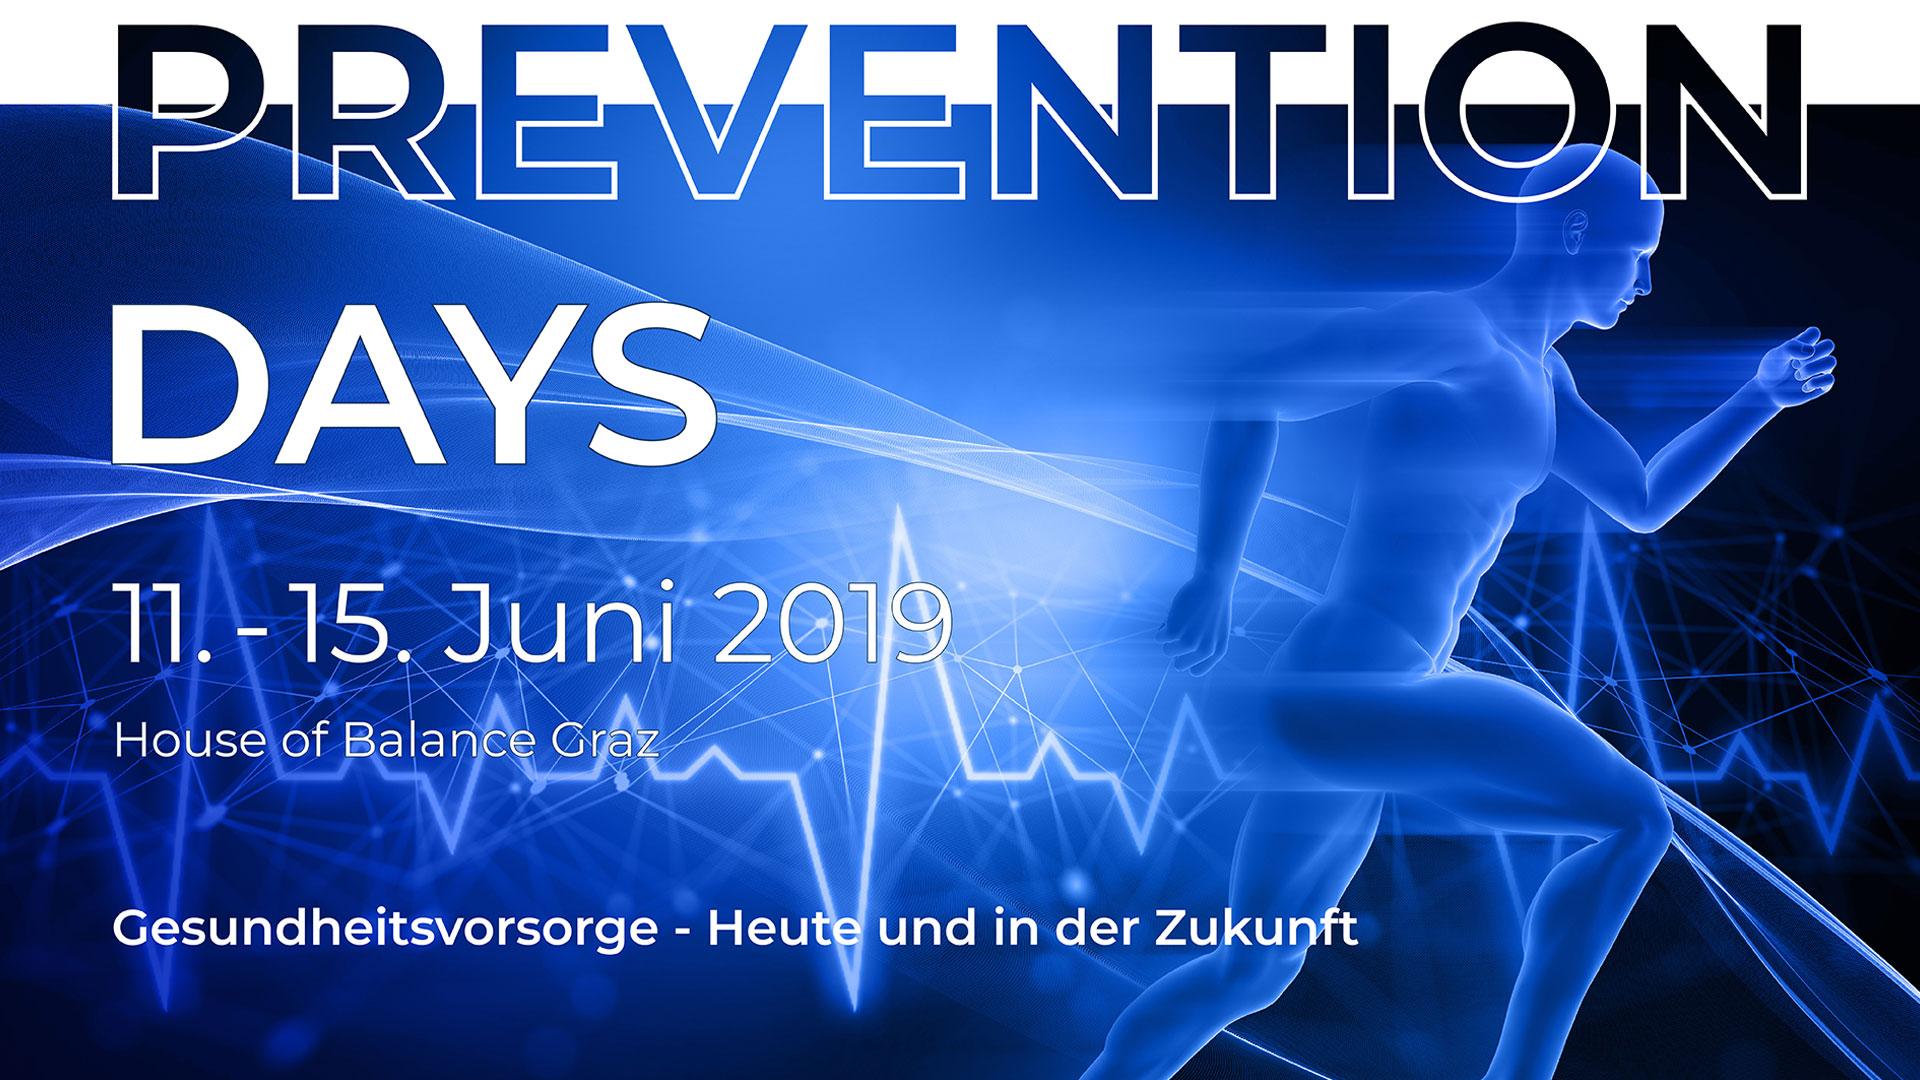 Health Prevention Days Graz